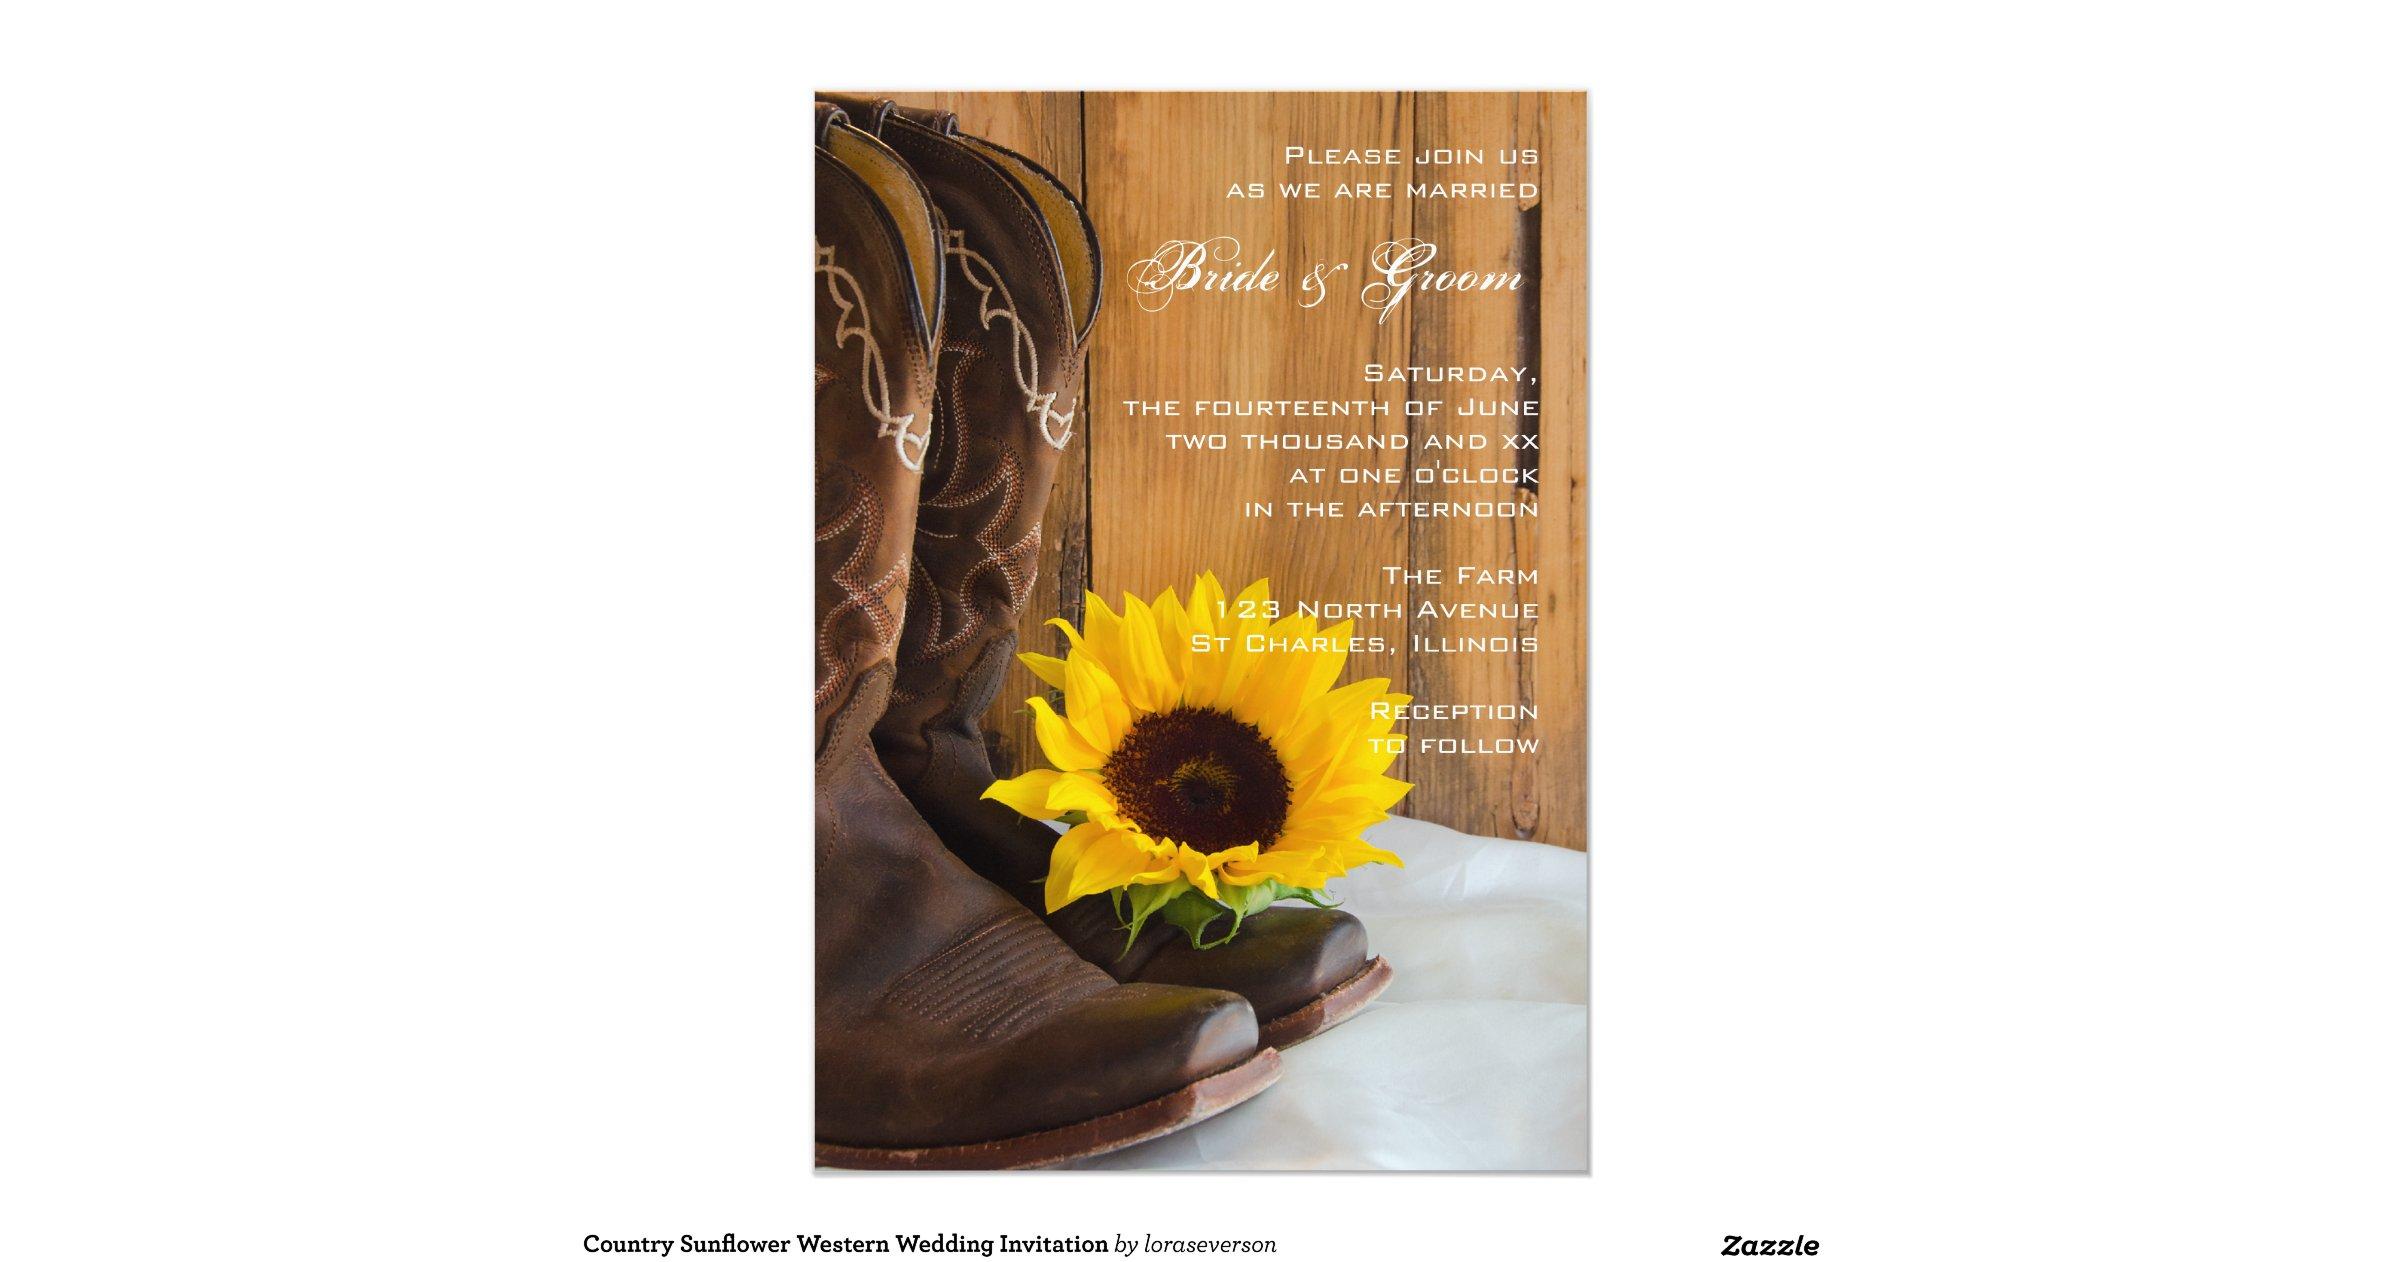 Western Wedding Invites: Country_sunflower_western_wedding_invitation